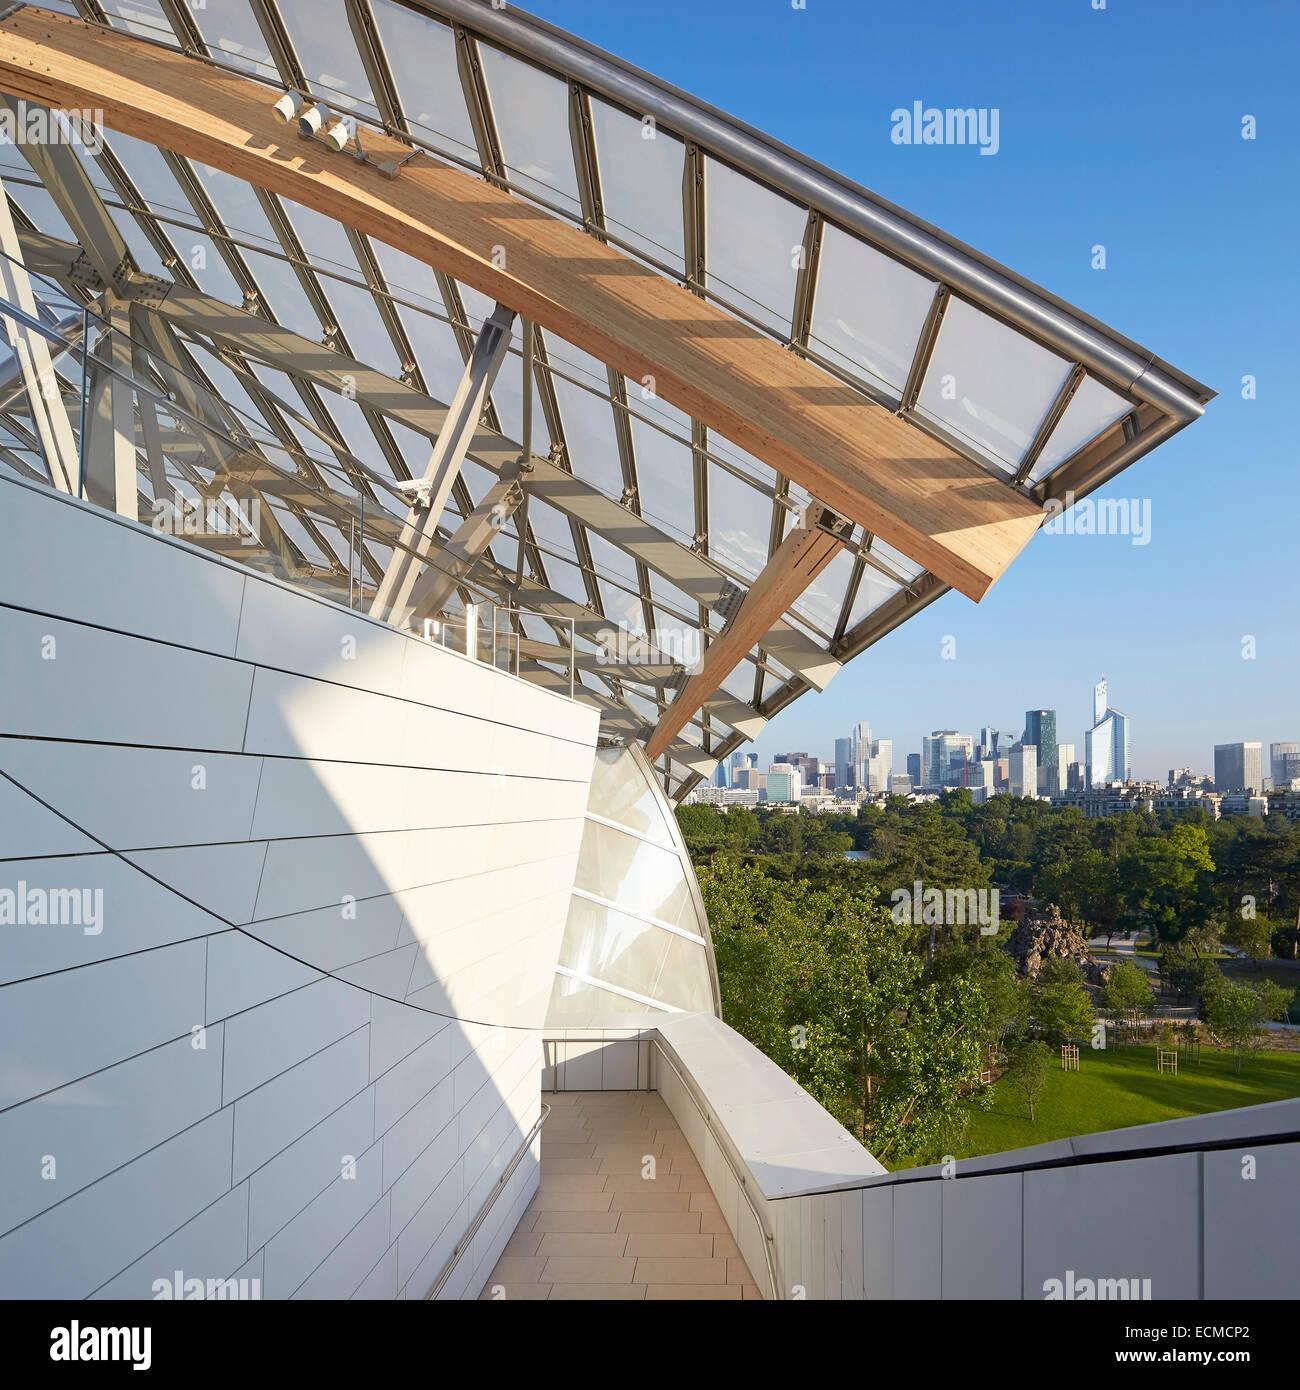 Fondation Louis Vuitton, Paris, France. Architect: Gehry Partners LLP, 2014. Upper terrace with view to Bois de Boulogne and cit Stock Photo